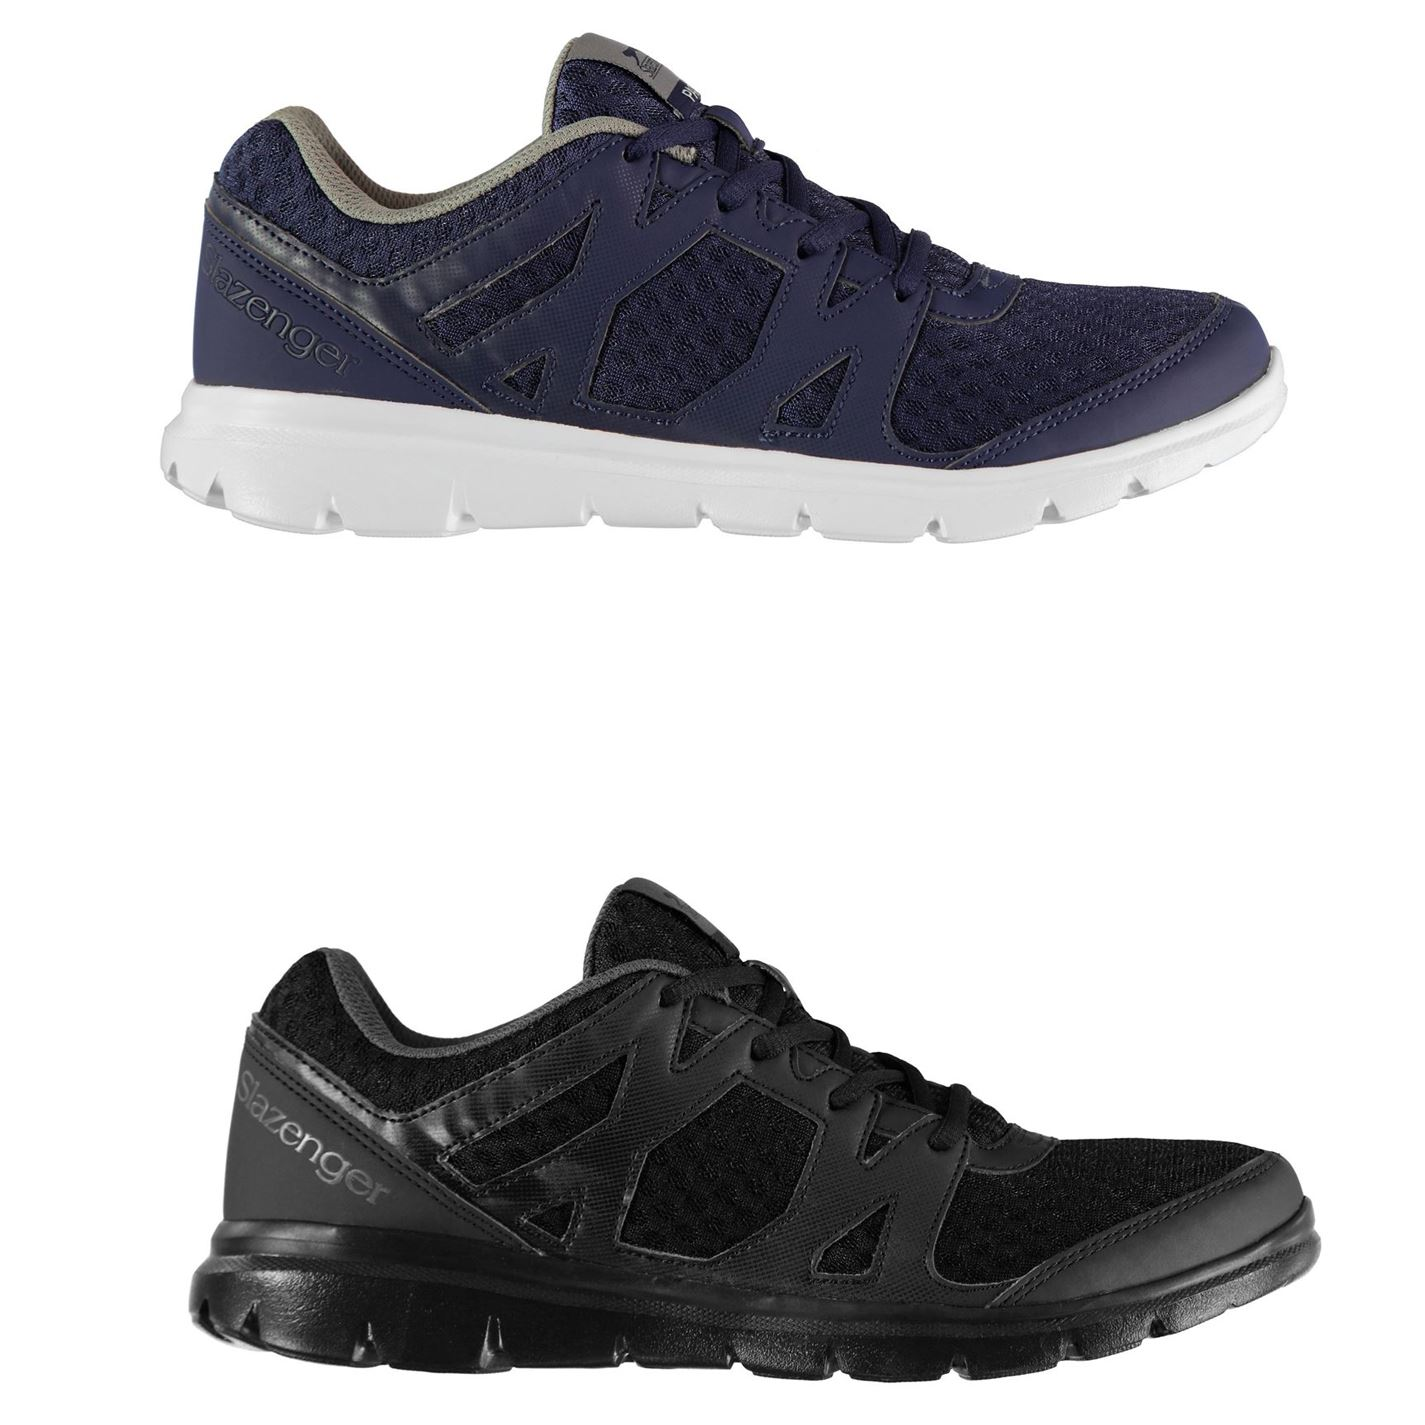 Slazenger Pace Trainers Mens Shoes